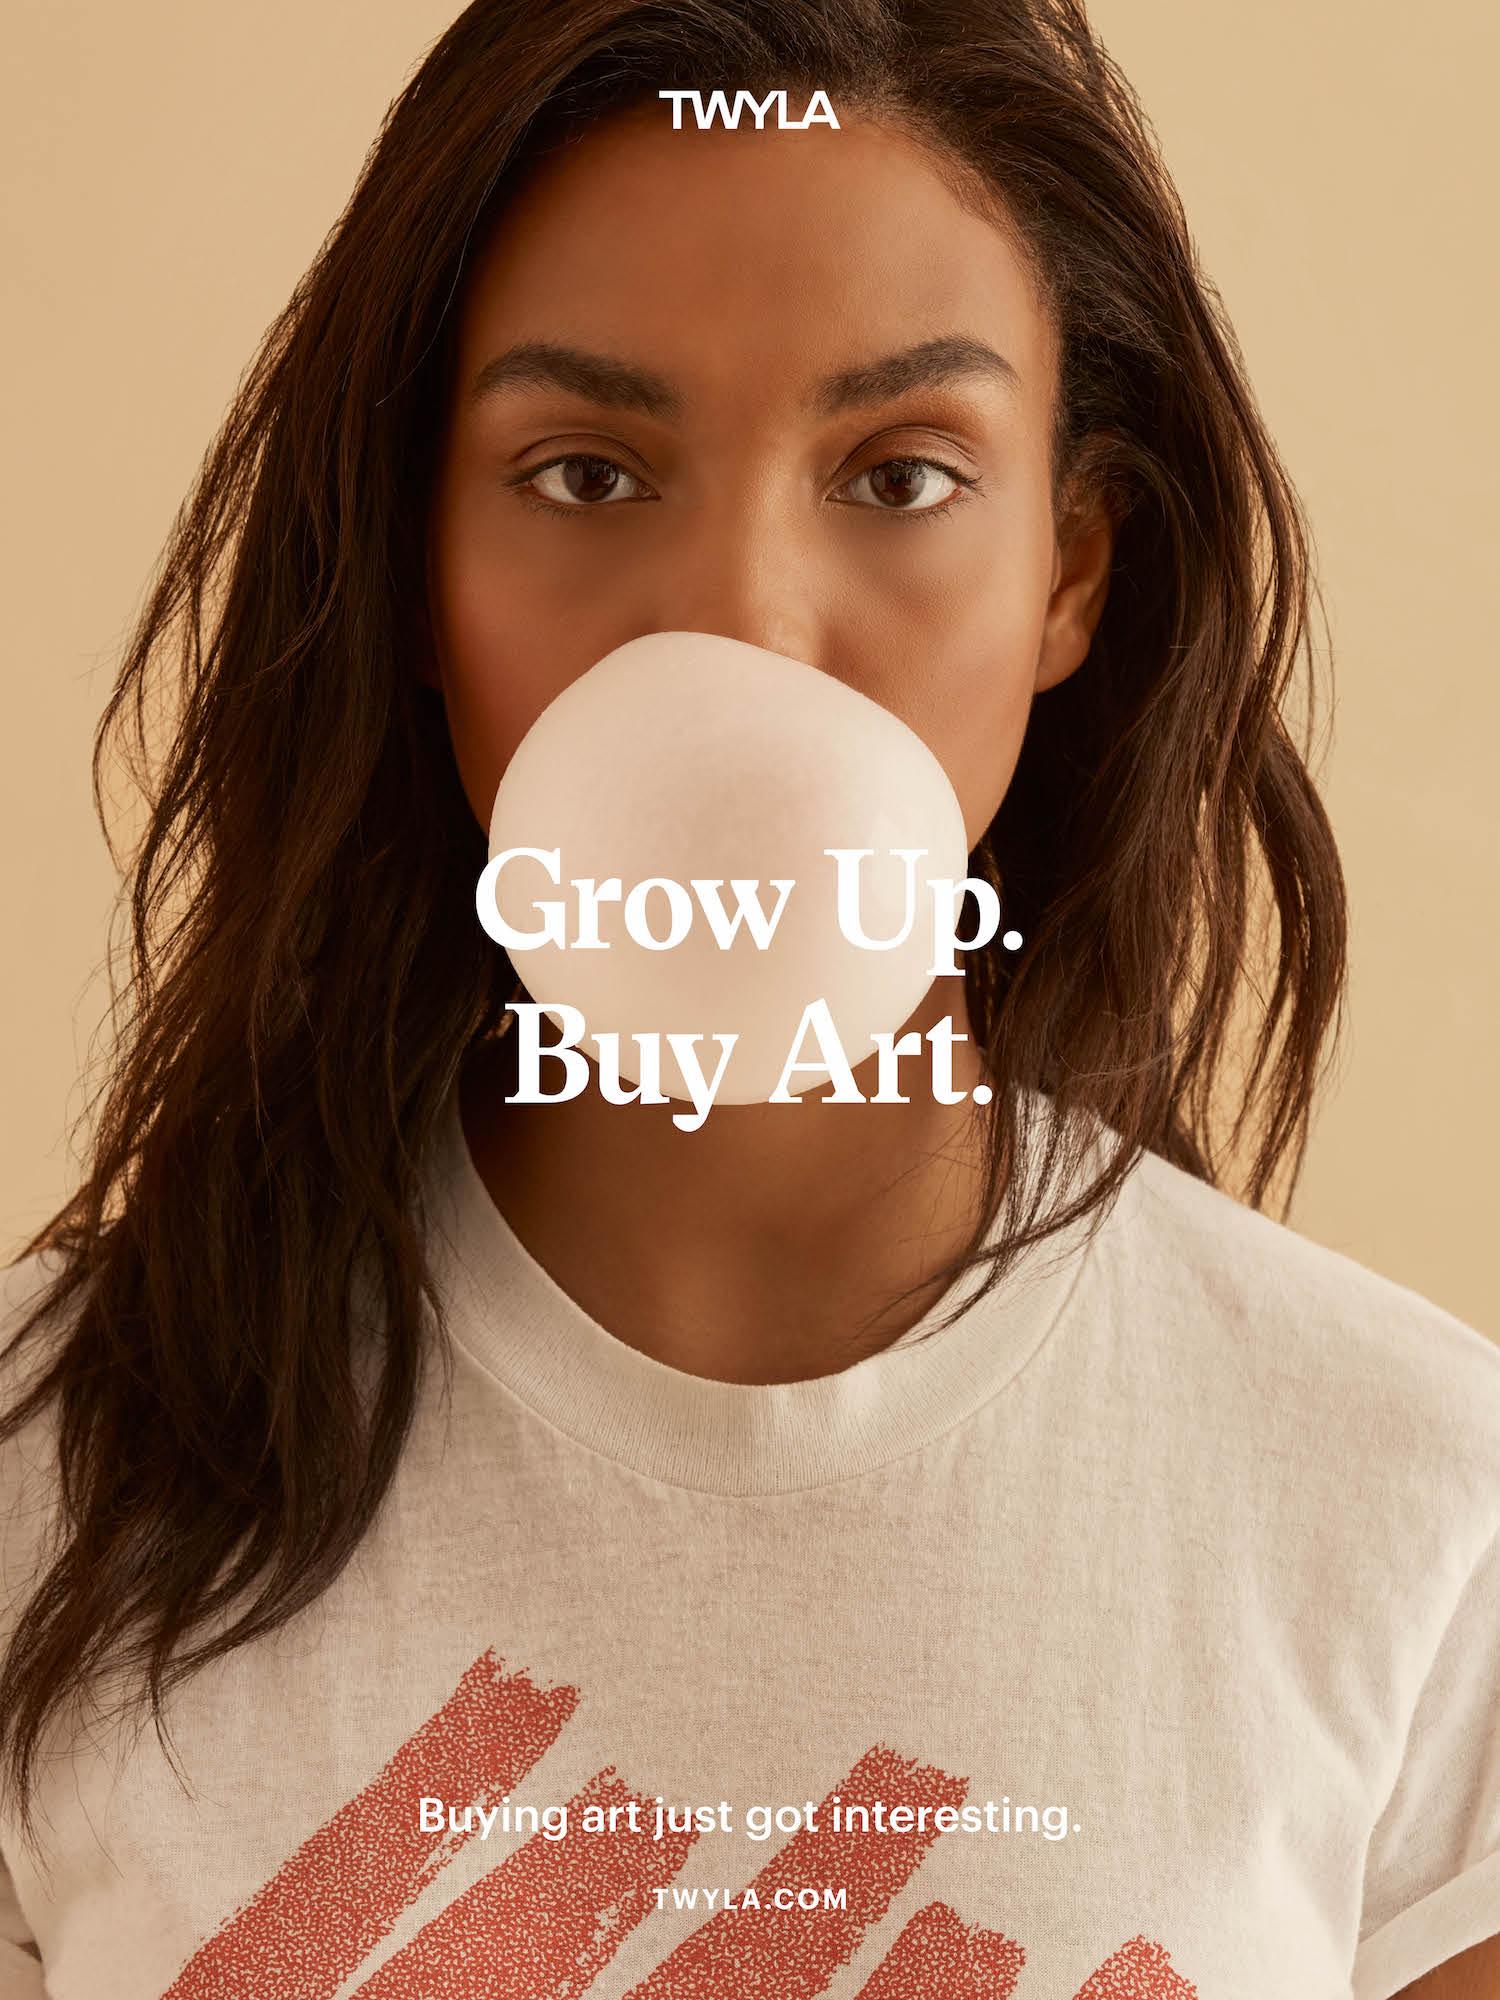 Grow_Up copy.jpg